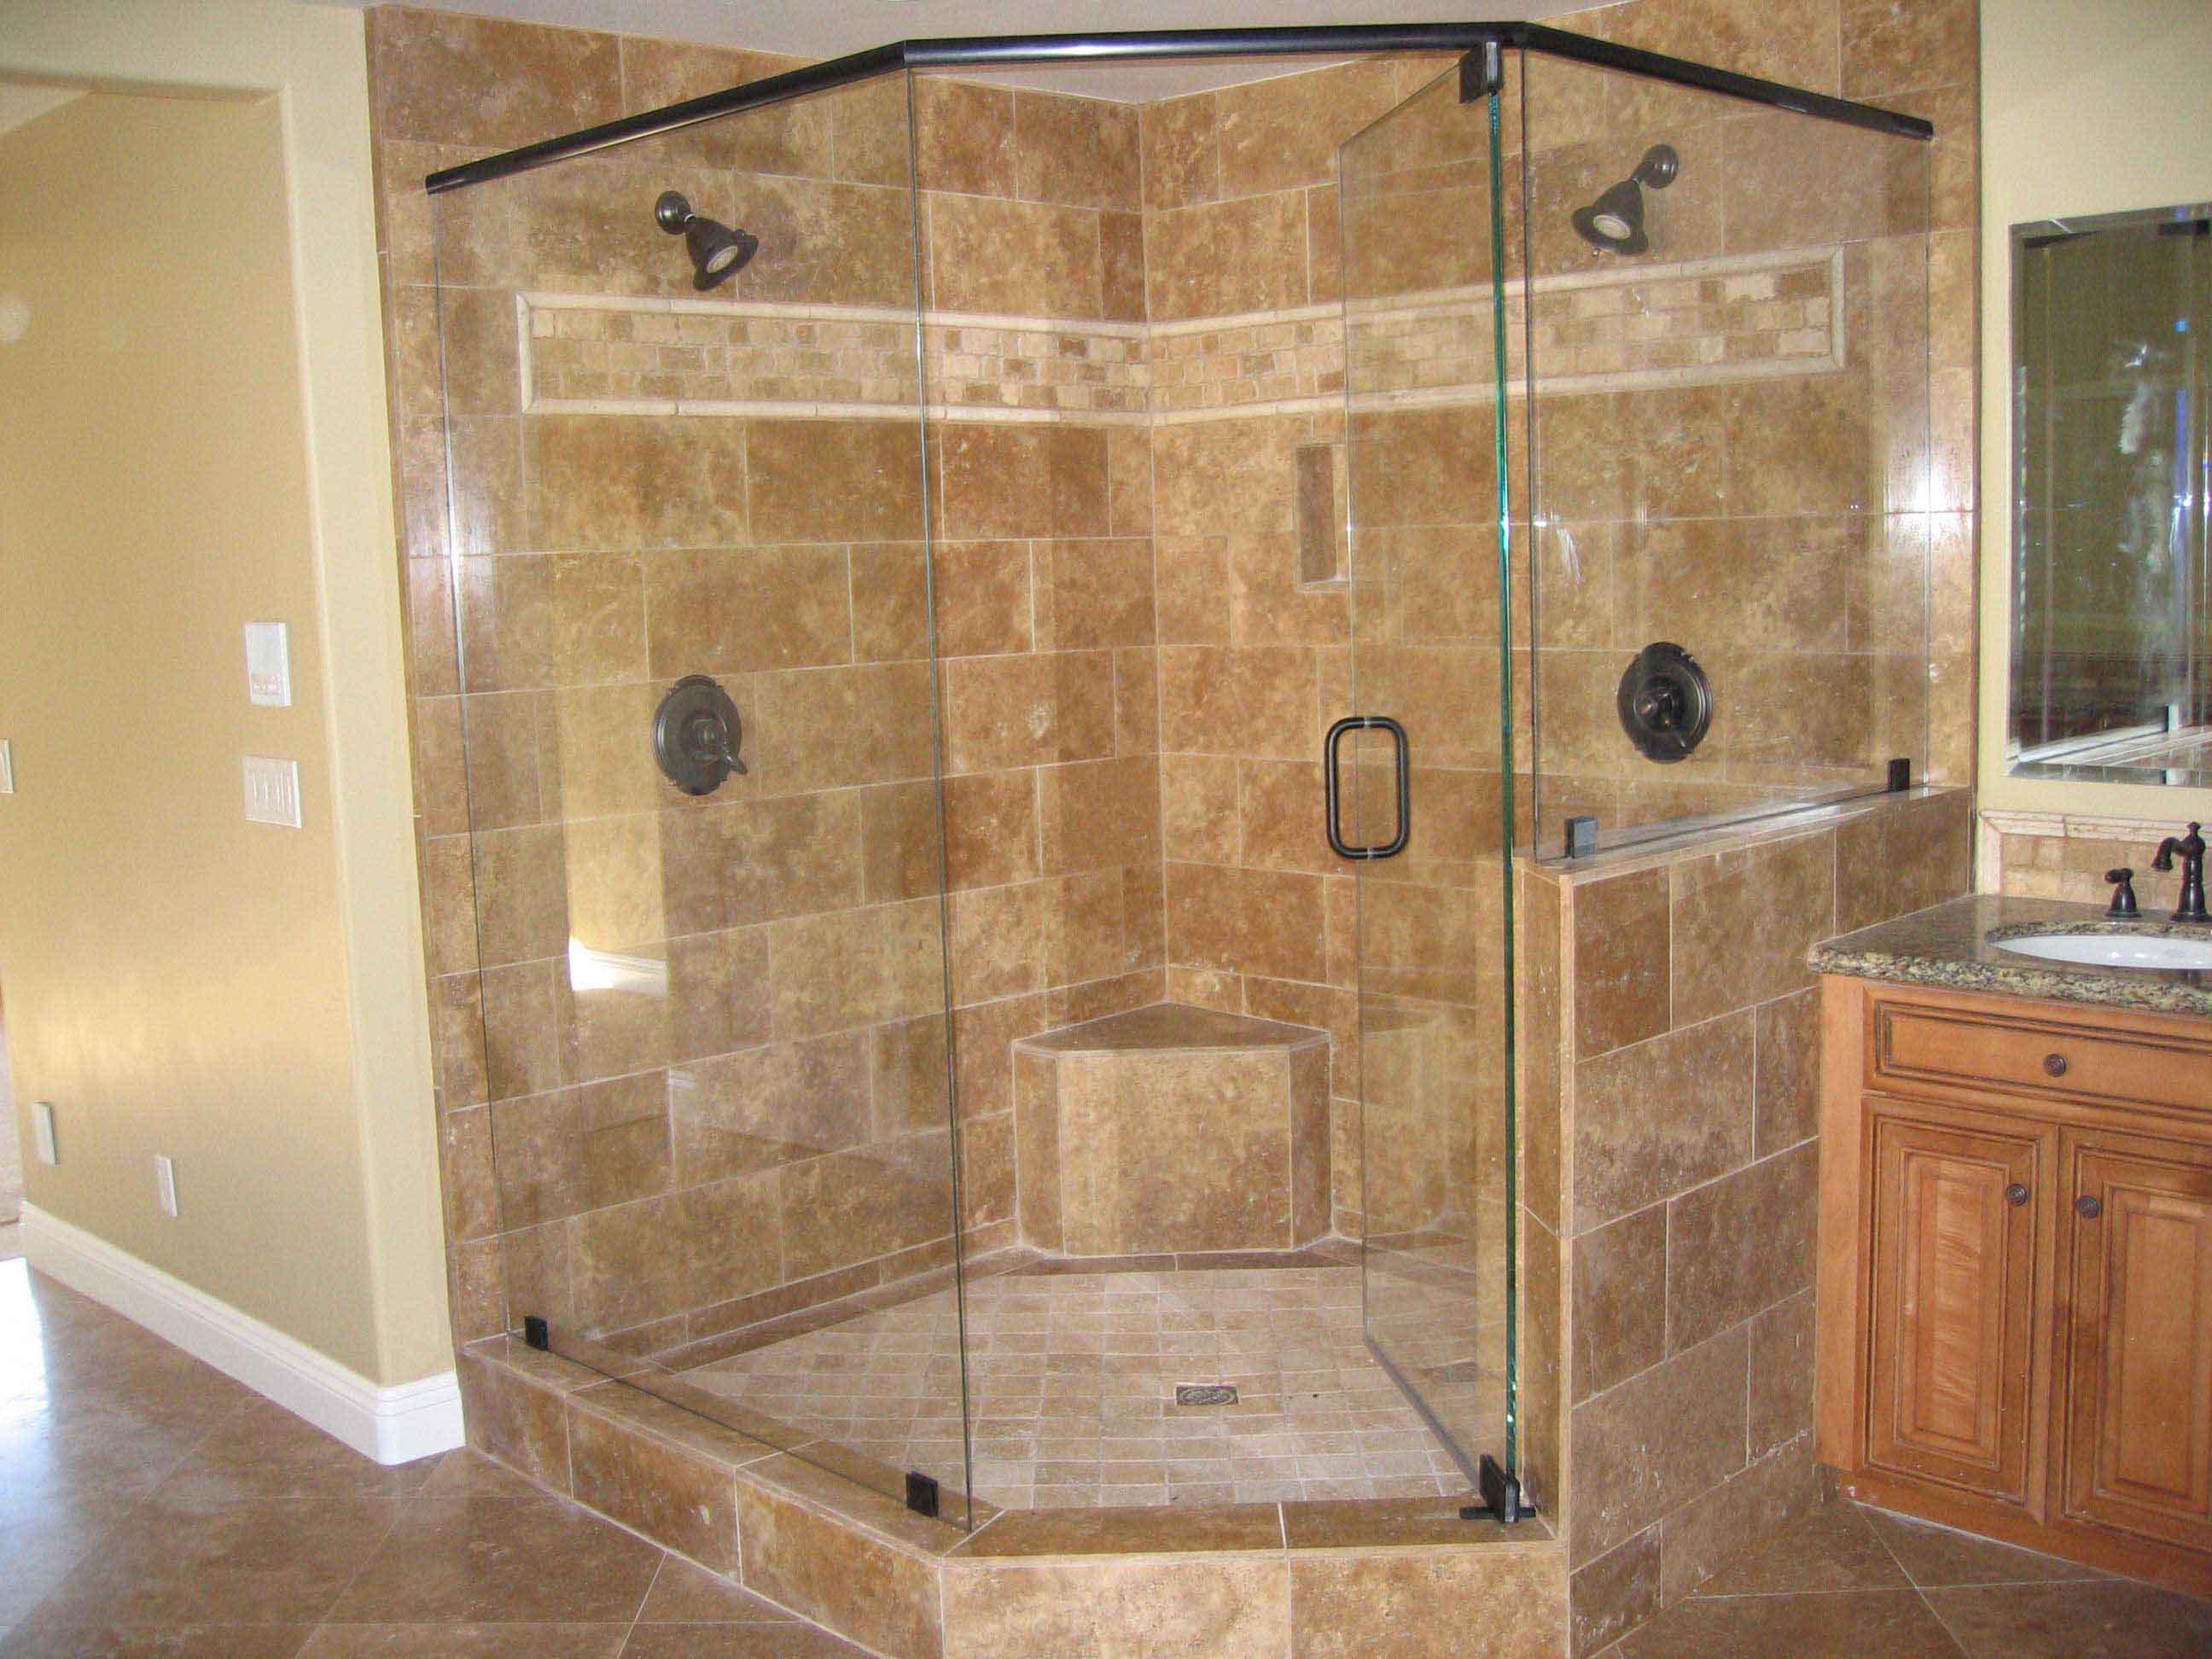 36 inch corner shower. Framelss Shower Doors For Corner Units  HomesFeed